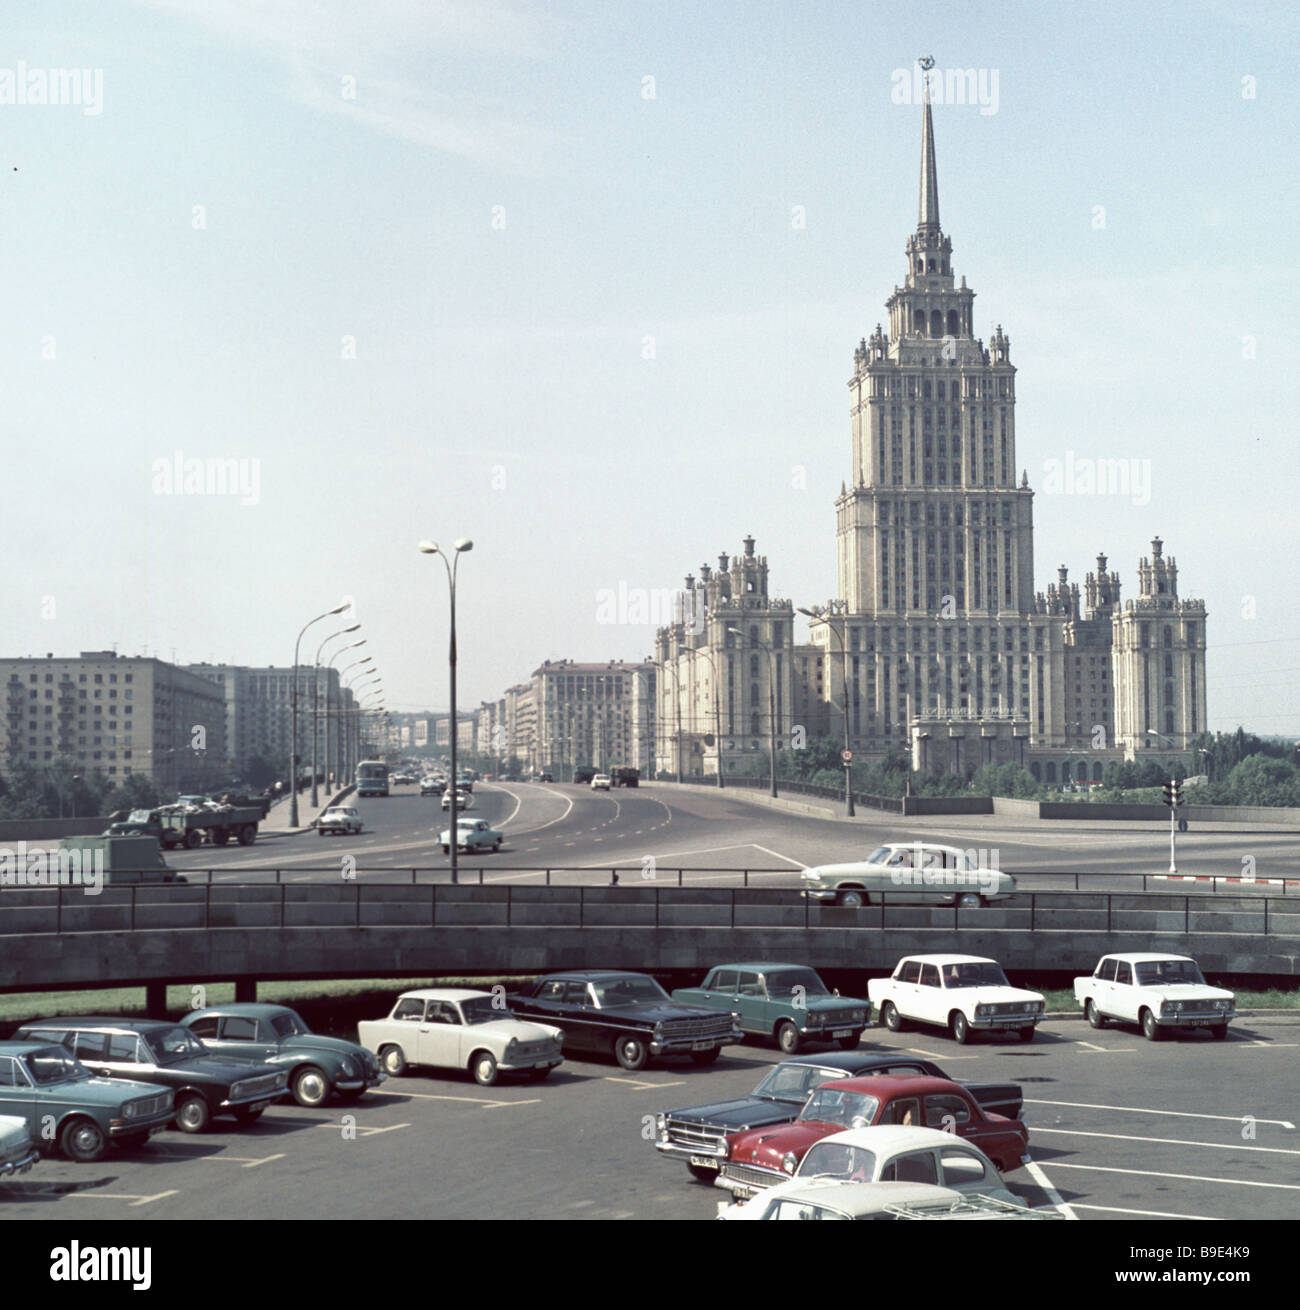 The Ukraine Hotel the Kutuzov Avenue in Moscow - Stock Image